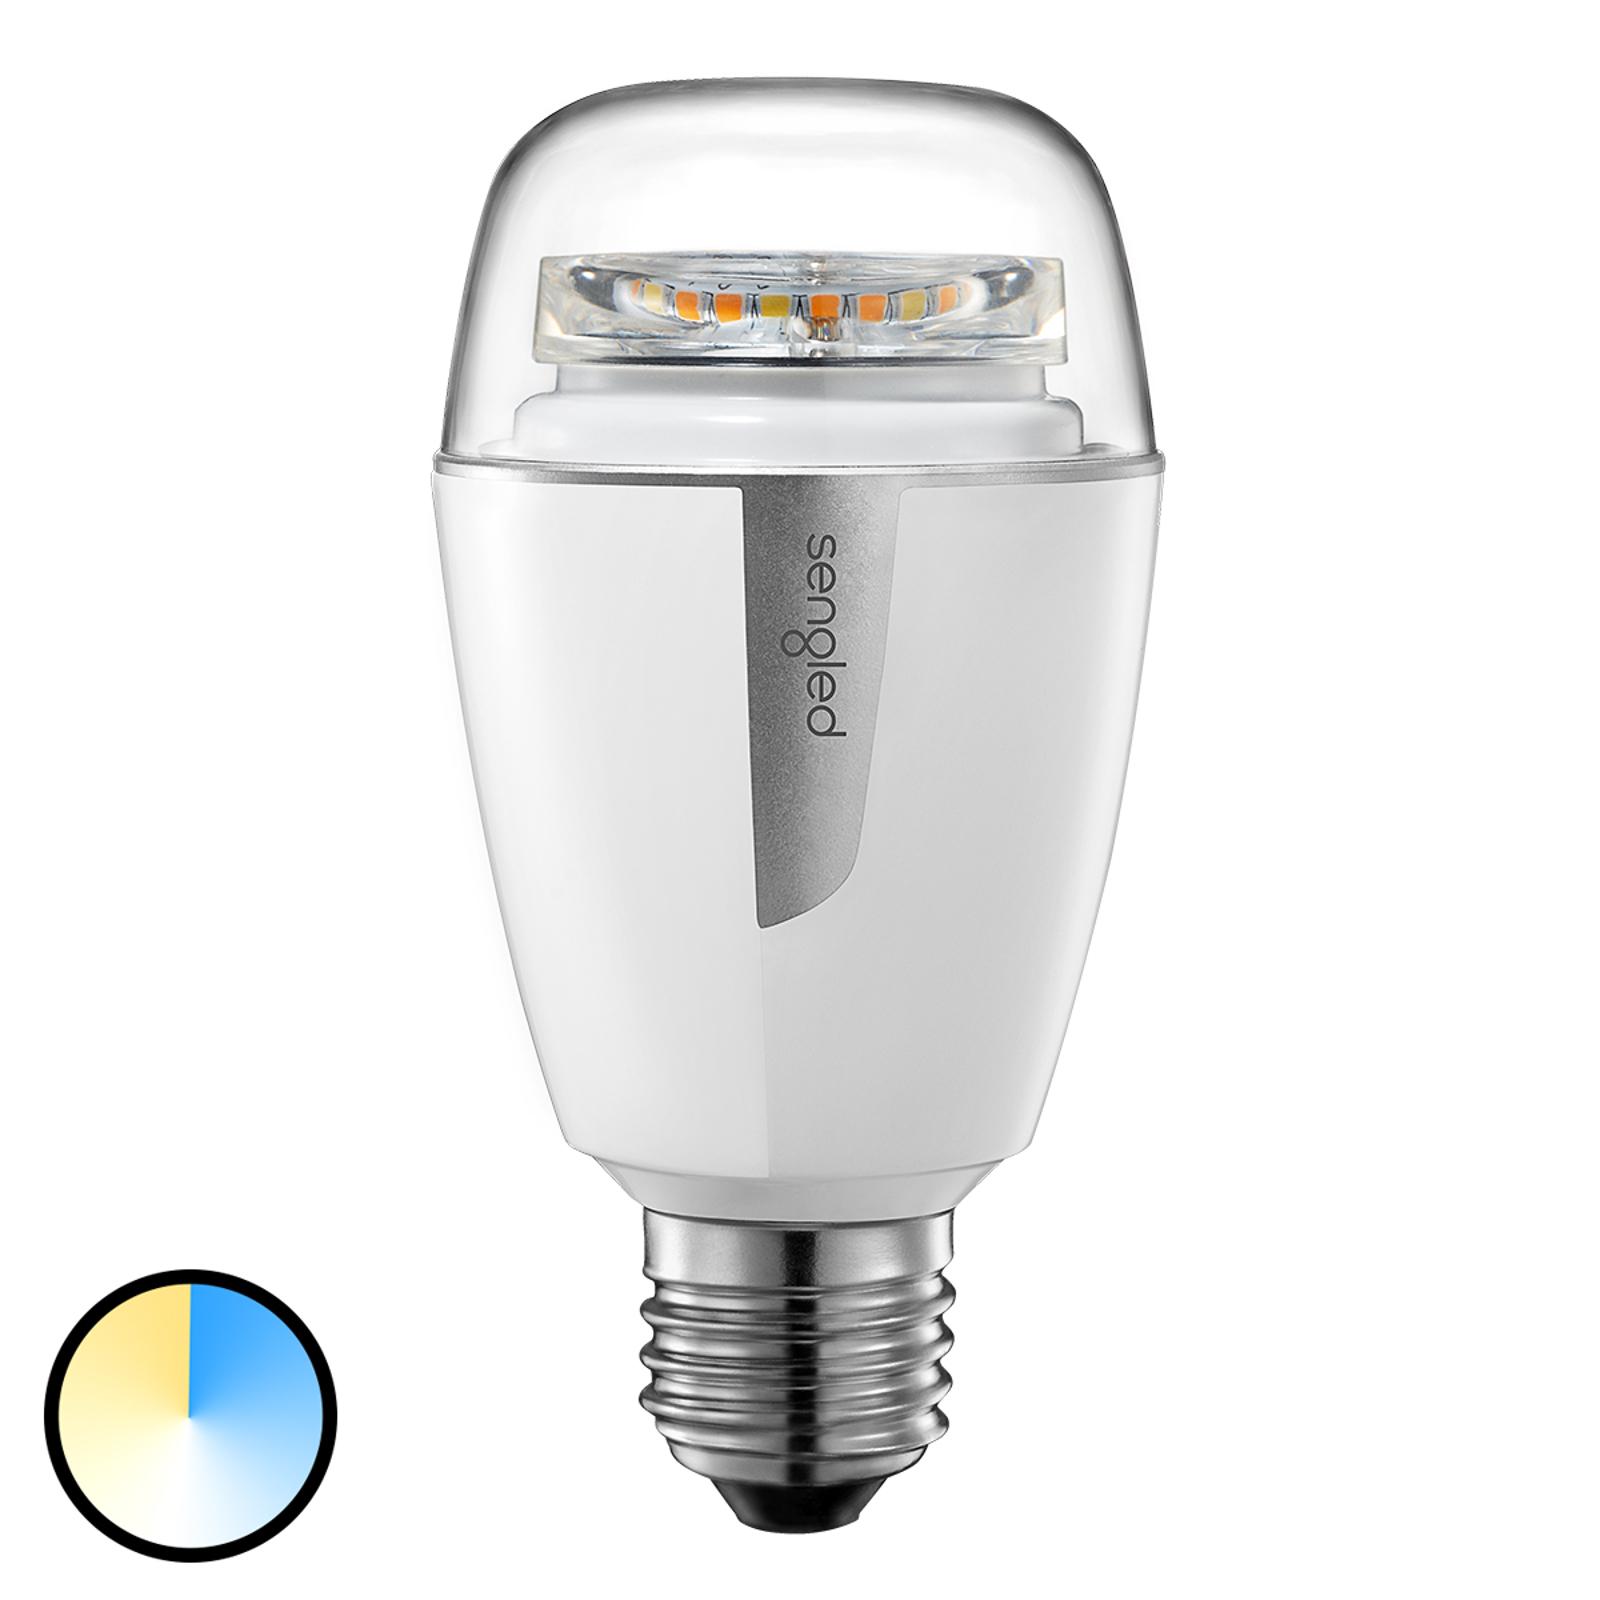 Sengled Element Plus ampoule LED E27 9,8W ZigBee